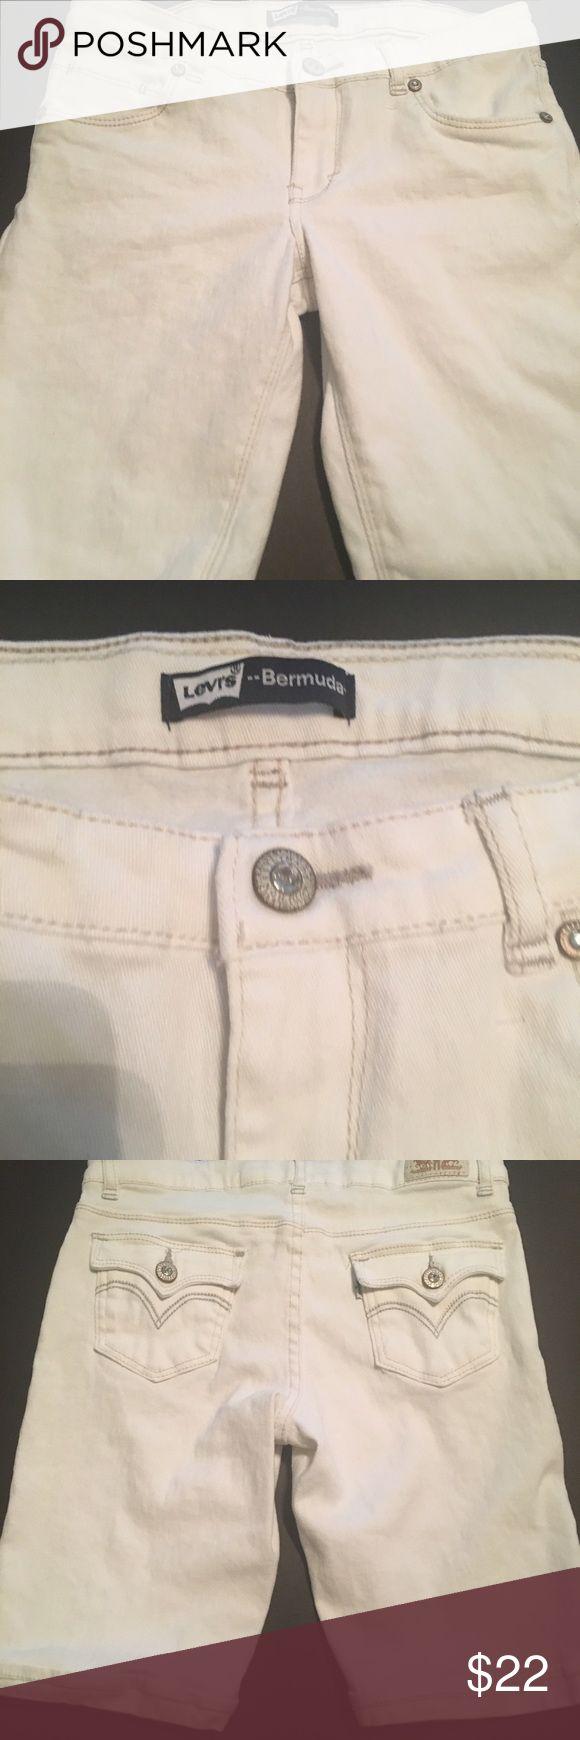 Levi Bermuda denim shorts girls Levi denim white Bermuda girls size 16 shorts NWOT Levi's Bottoms Shorts